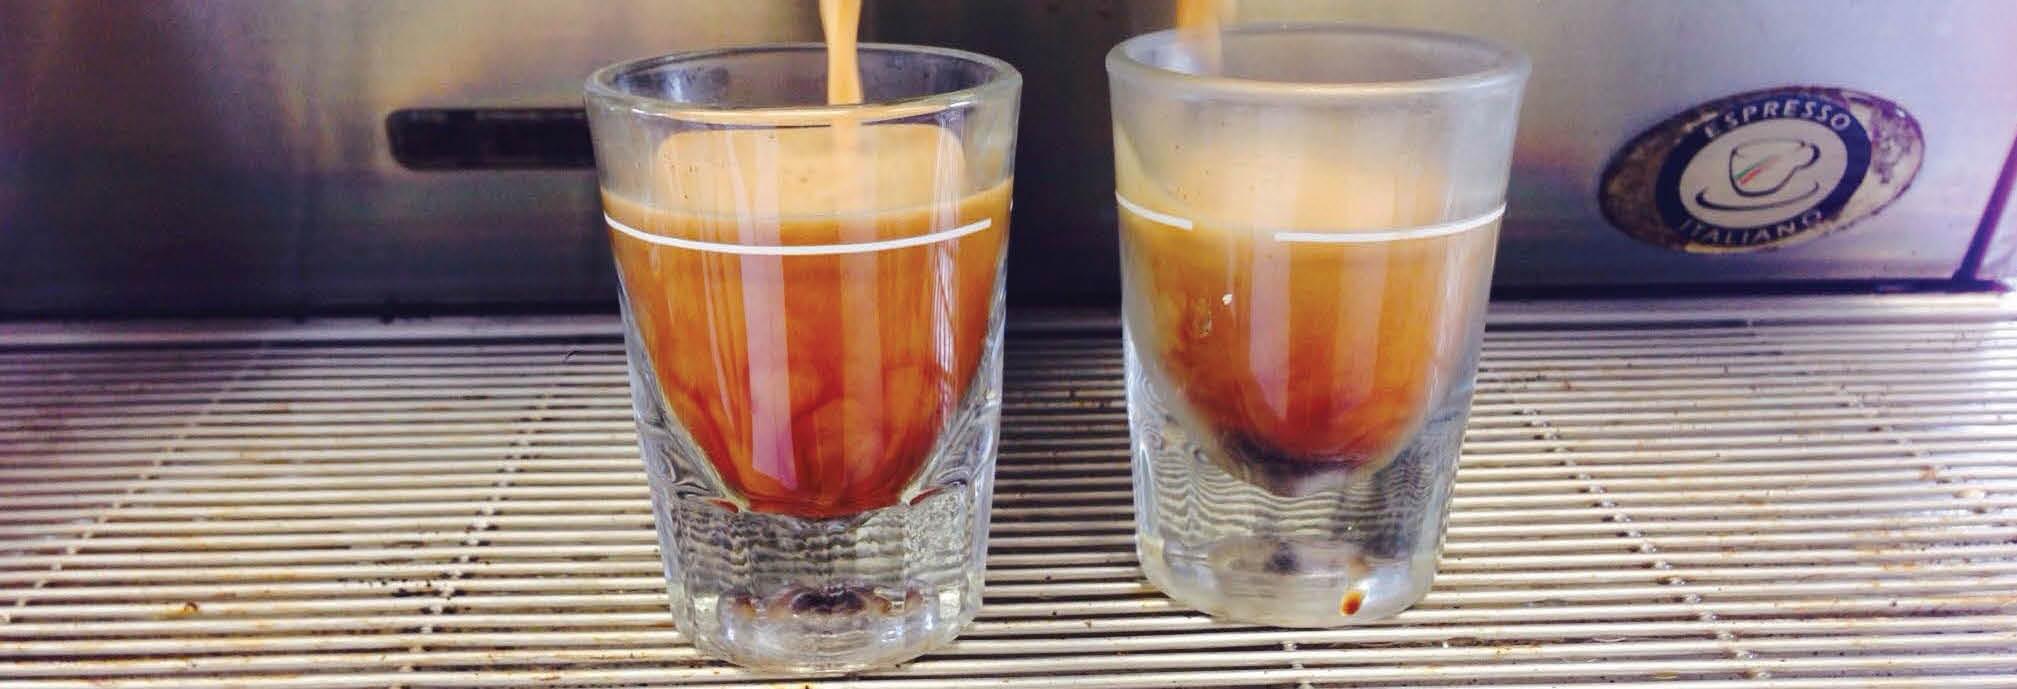 Jump n Bean Espresso main banner image - Lake Tapps, WA